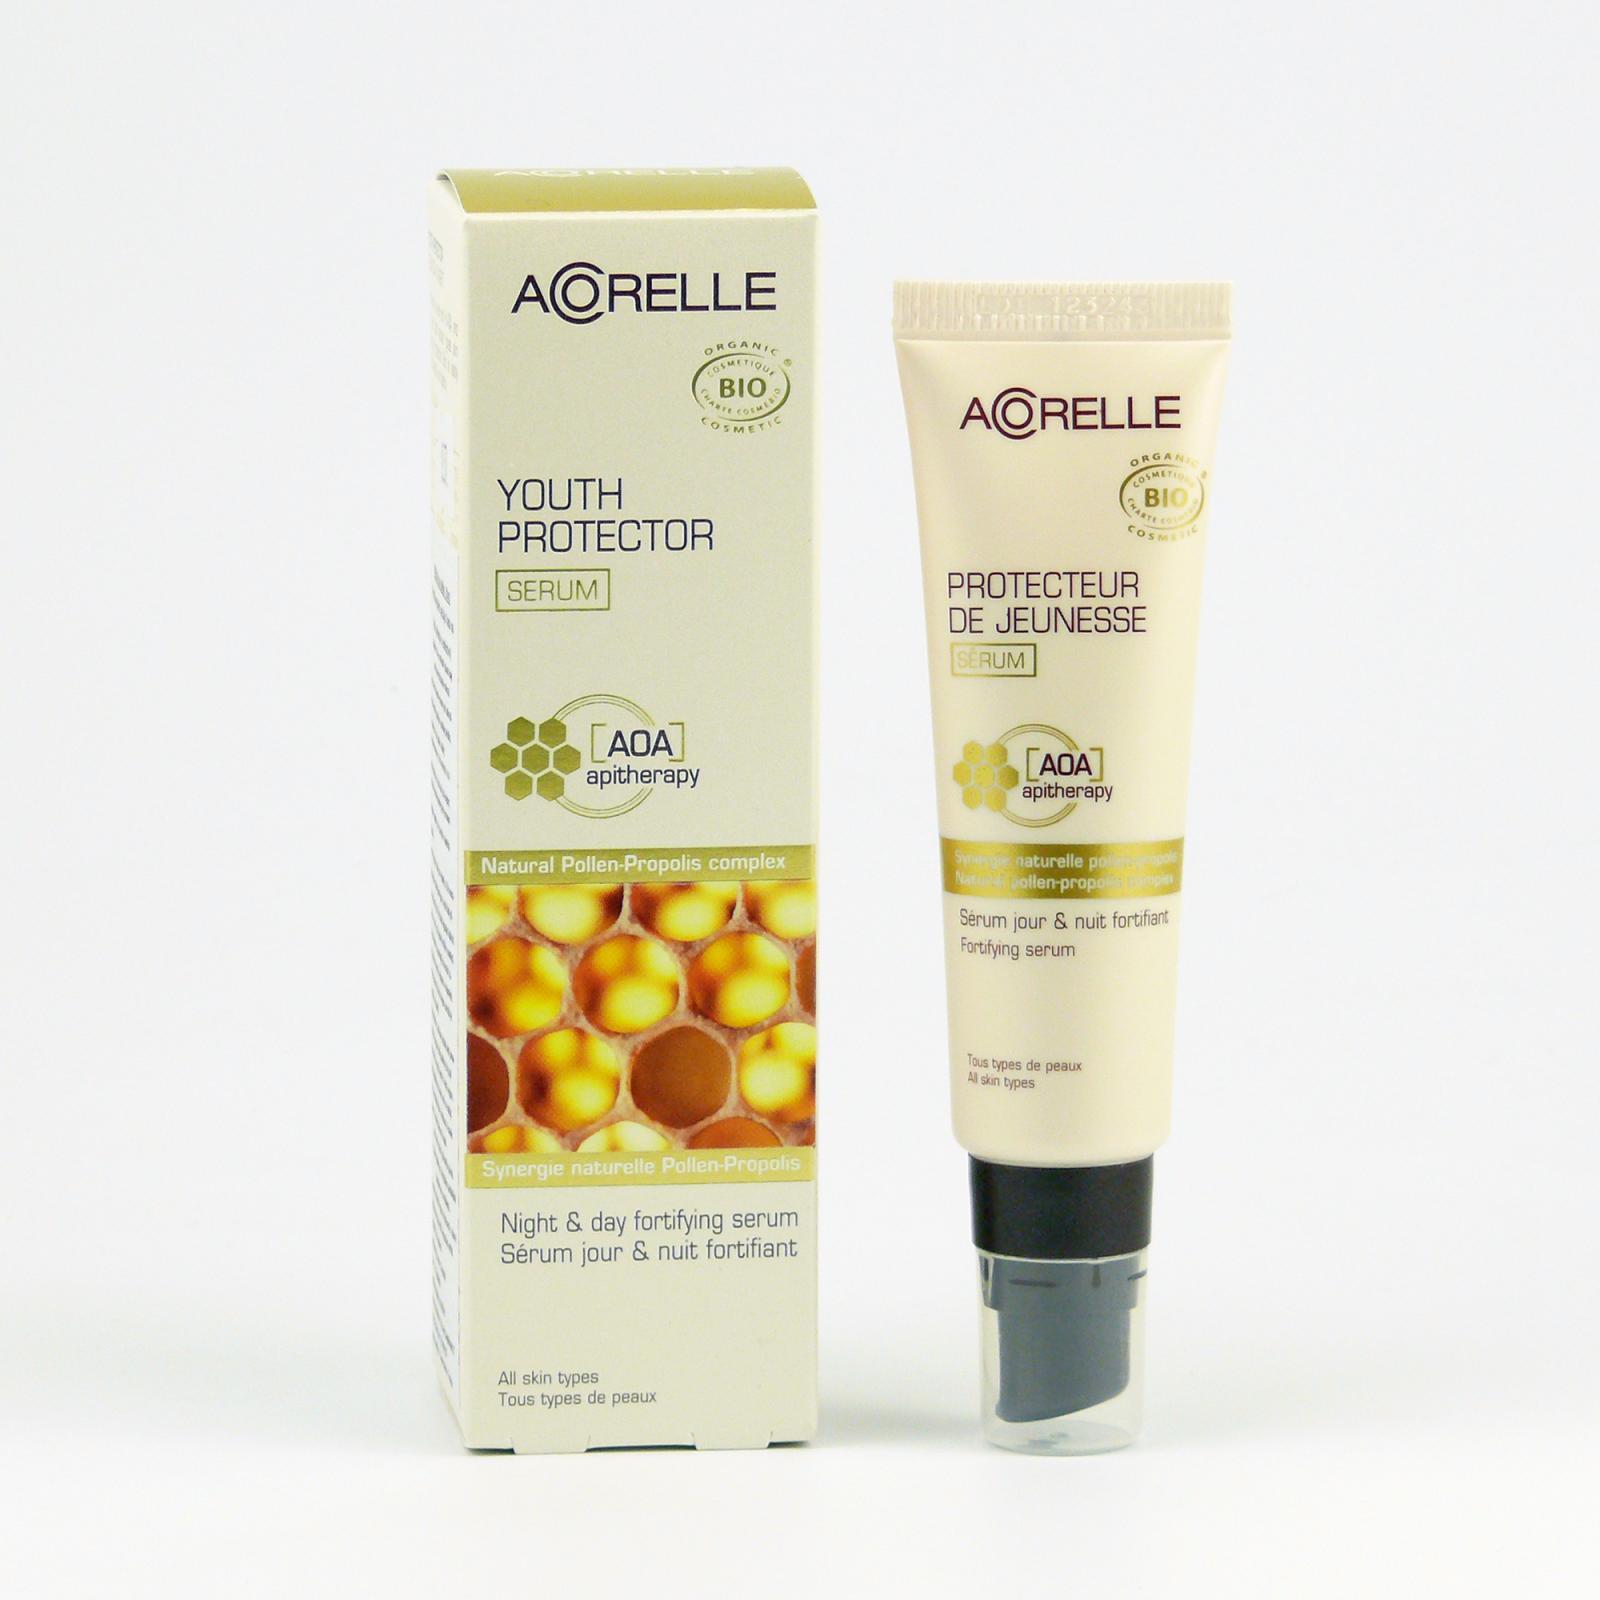 Acorelle Sérum na obličej s propolisem, Komplex AOA 30 ml